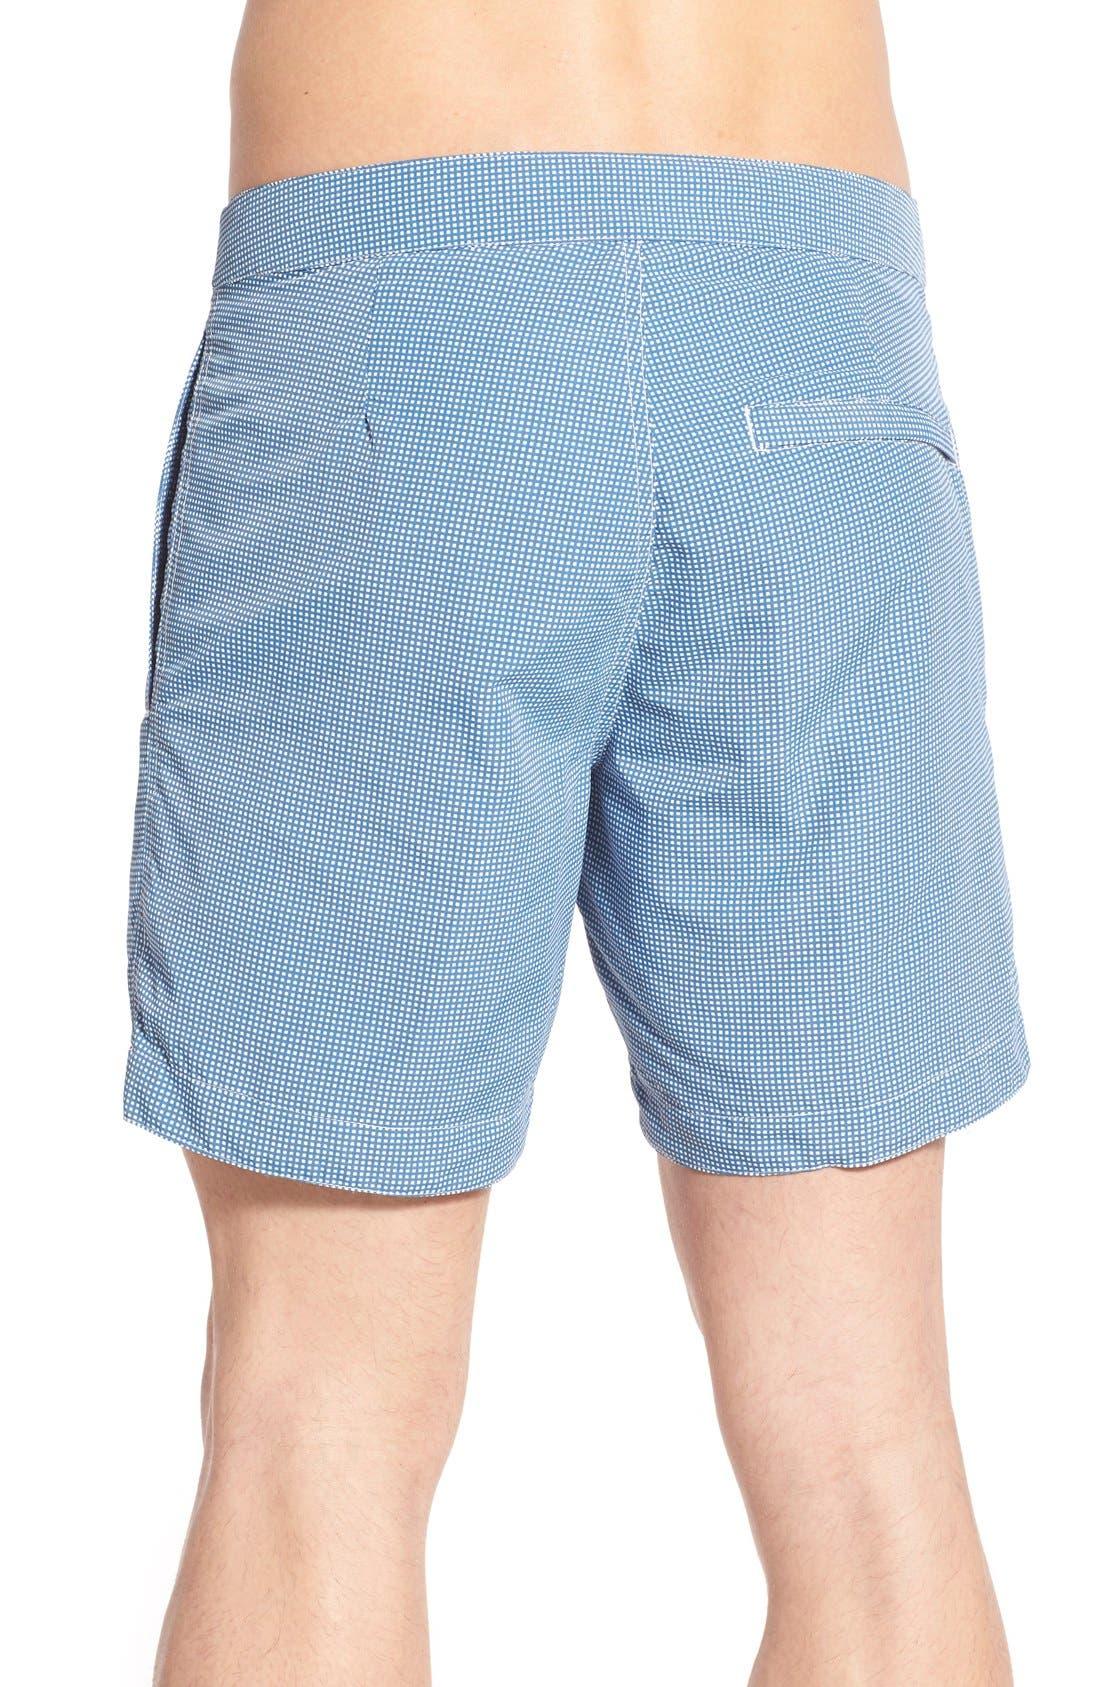 Aruba Tailored Fit Microcheck Swim Trunks,                             Alternate thumbnail 2, color,                             410